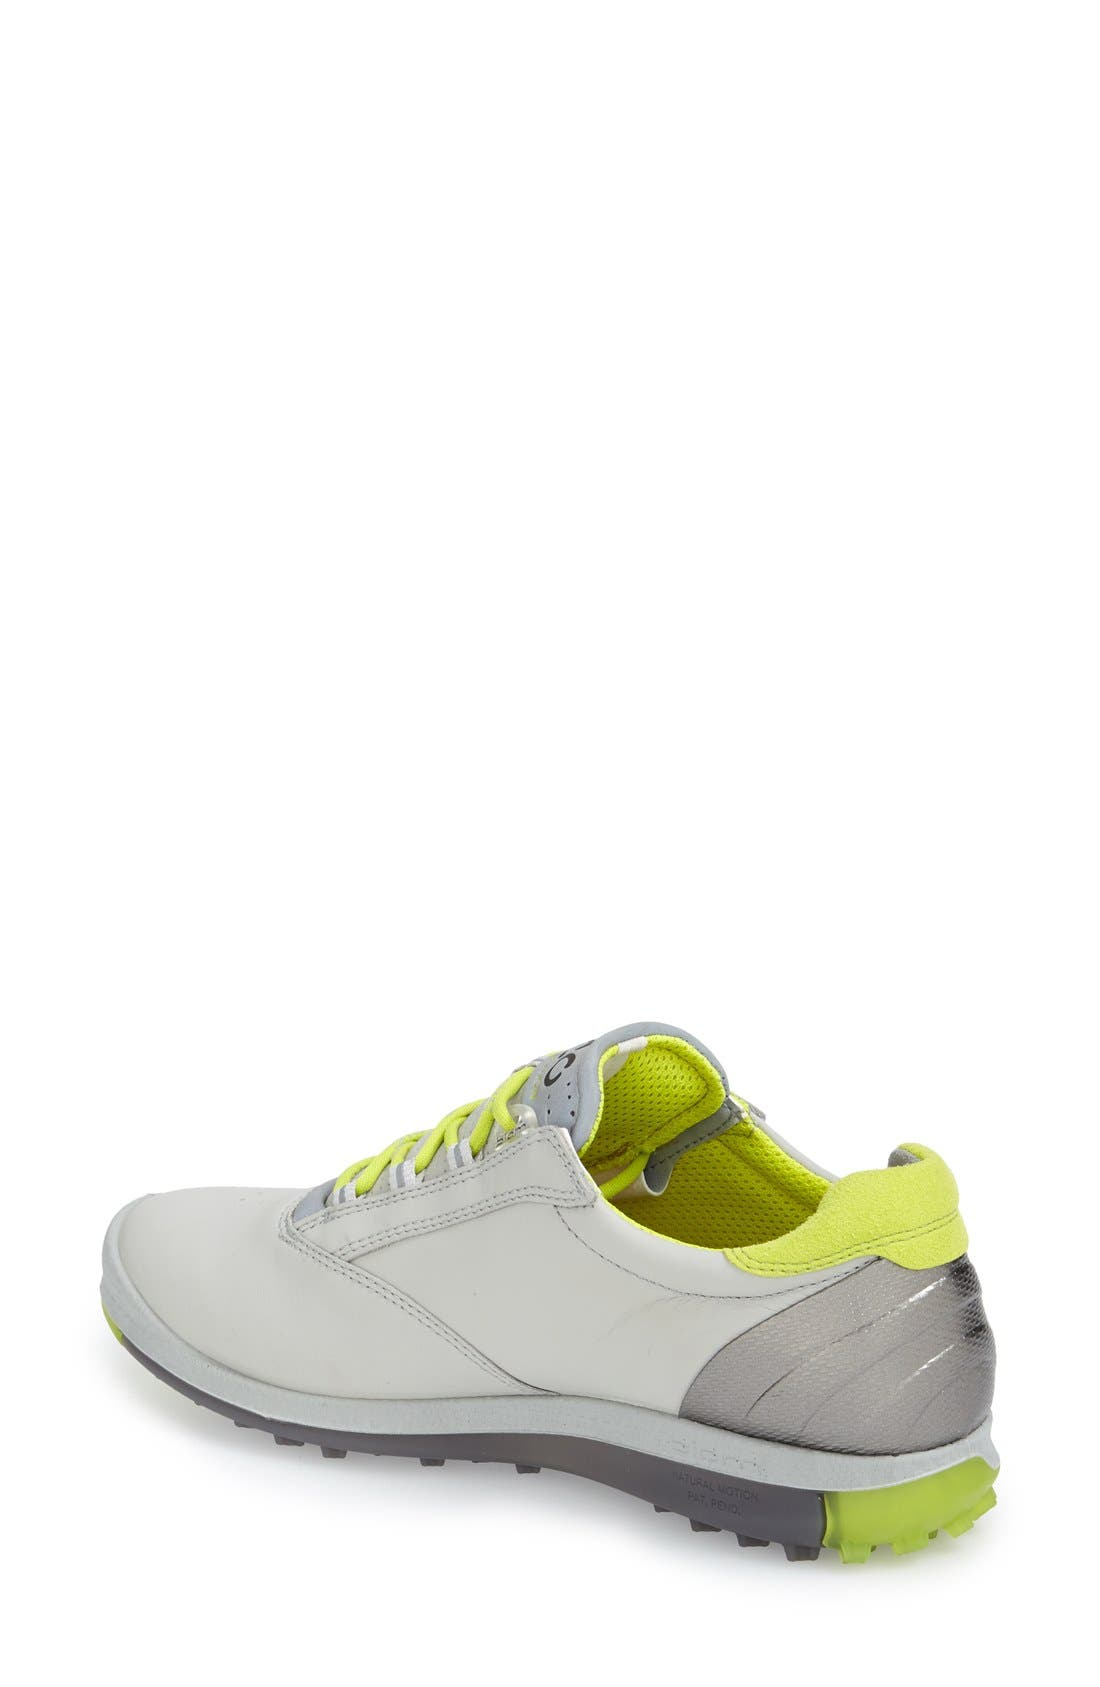 'BIOM' Hydromax<sup>®</sup> Waterproof Golf Shoe,                             Alternate thumbnail 2, color,                             Concrete Leather